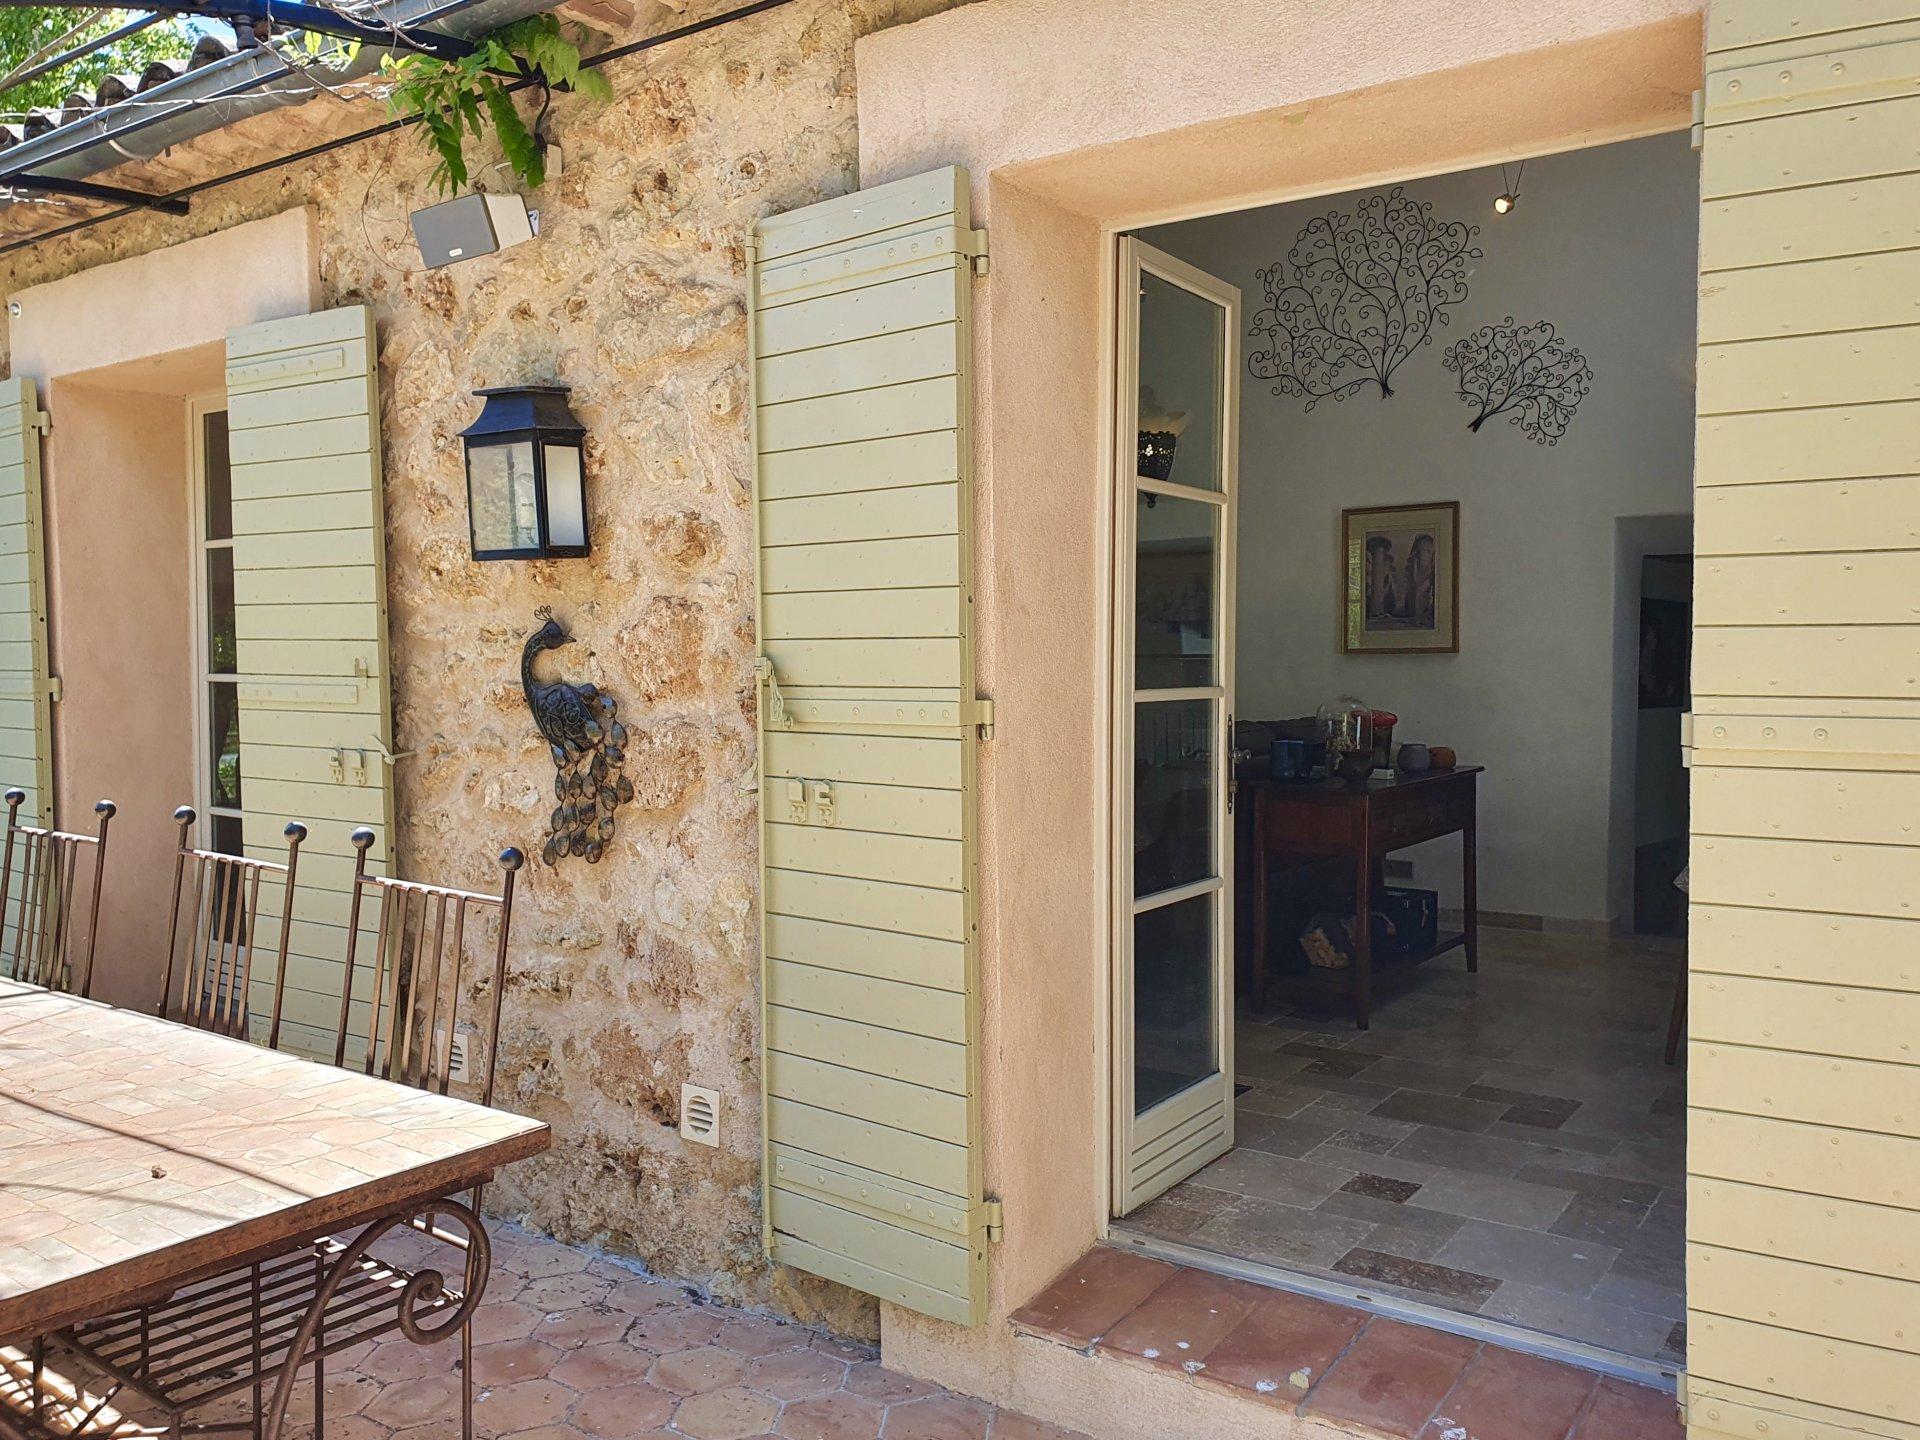 Provence! Belle bastide rénovée, 5 ch. Piscine chauffée.